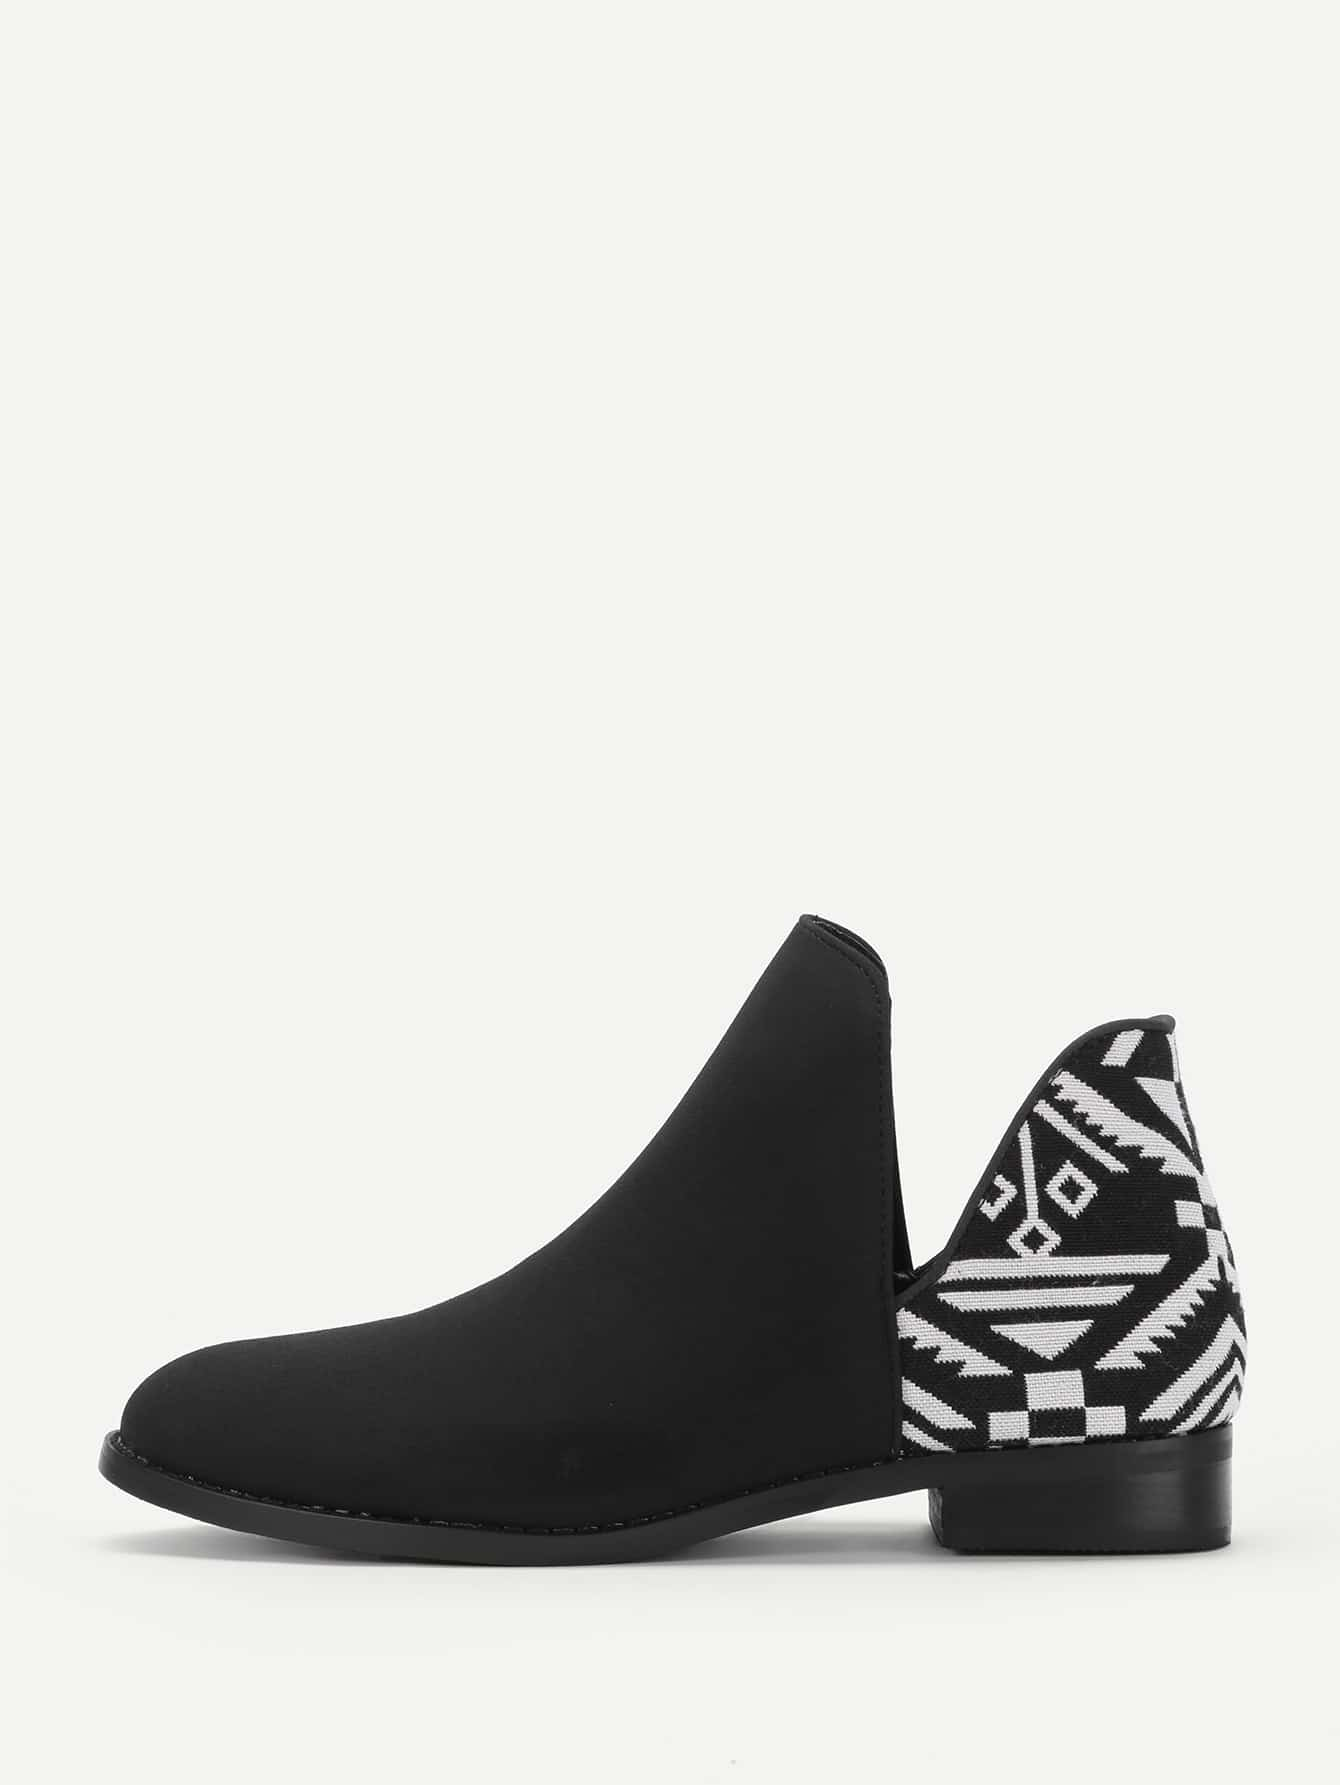 V Cut Chelsea Boots 17478 08 sm